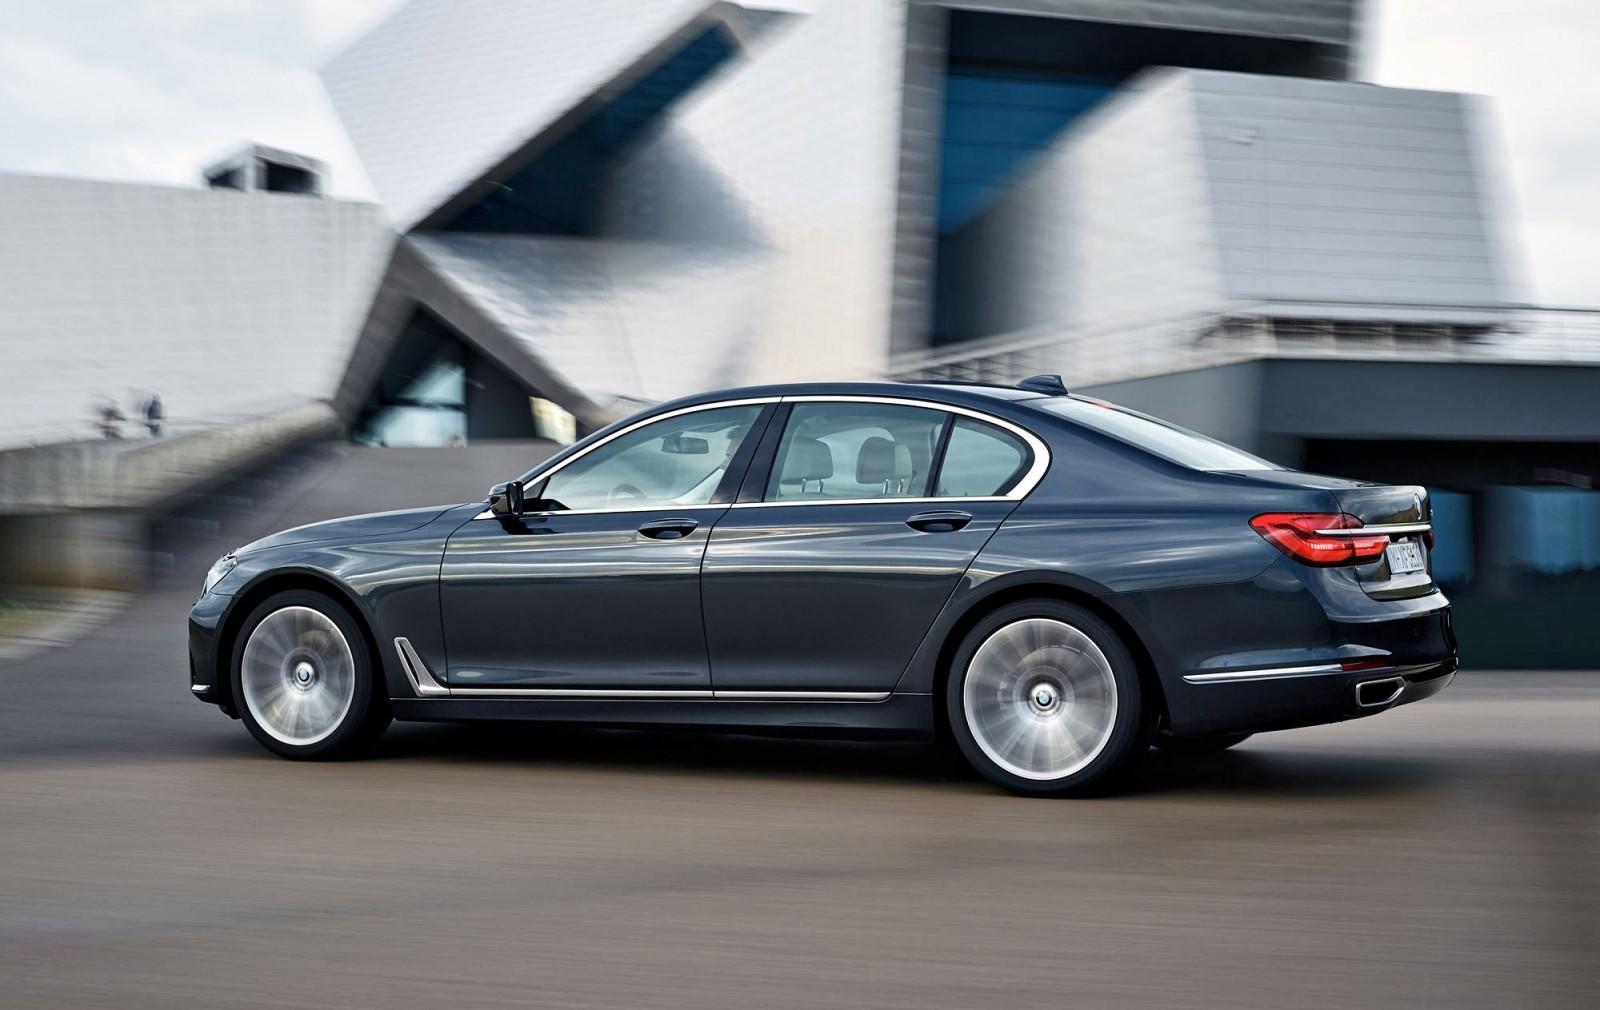 2016 BMW 750 Exterior Photos 3